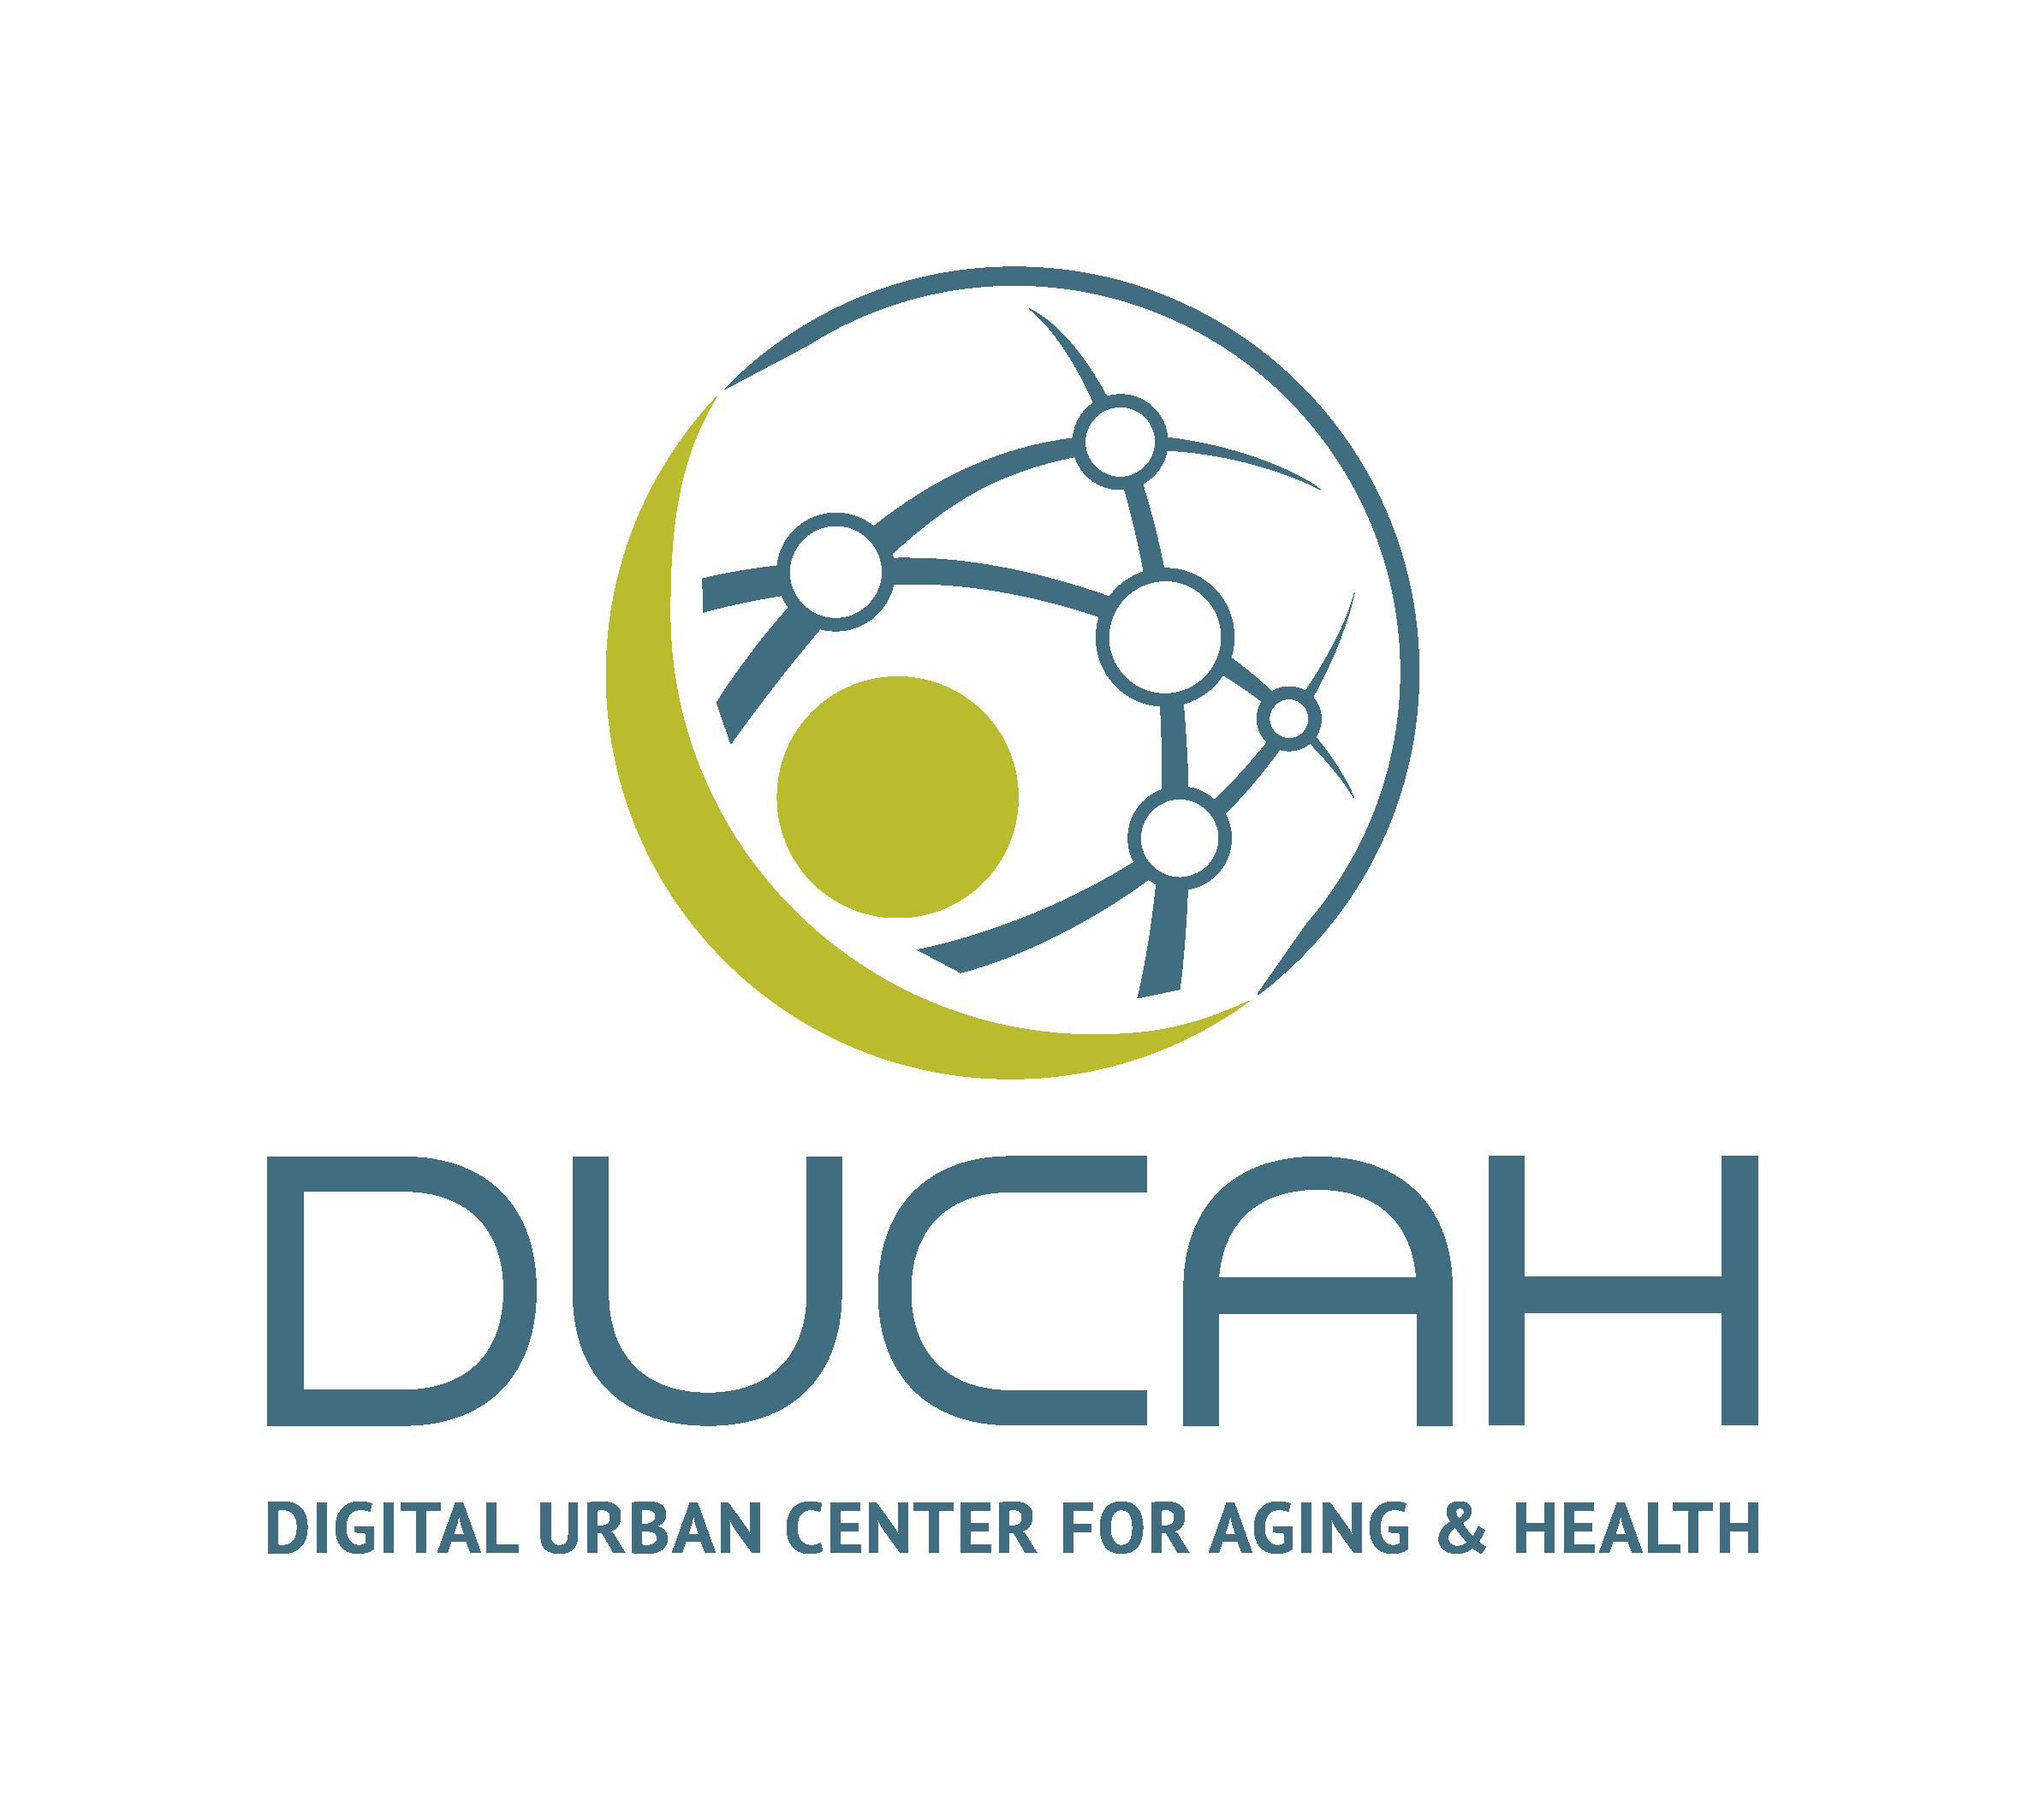 Digital Urban Center for Aging & Health | DUCAH